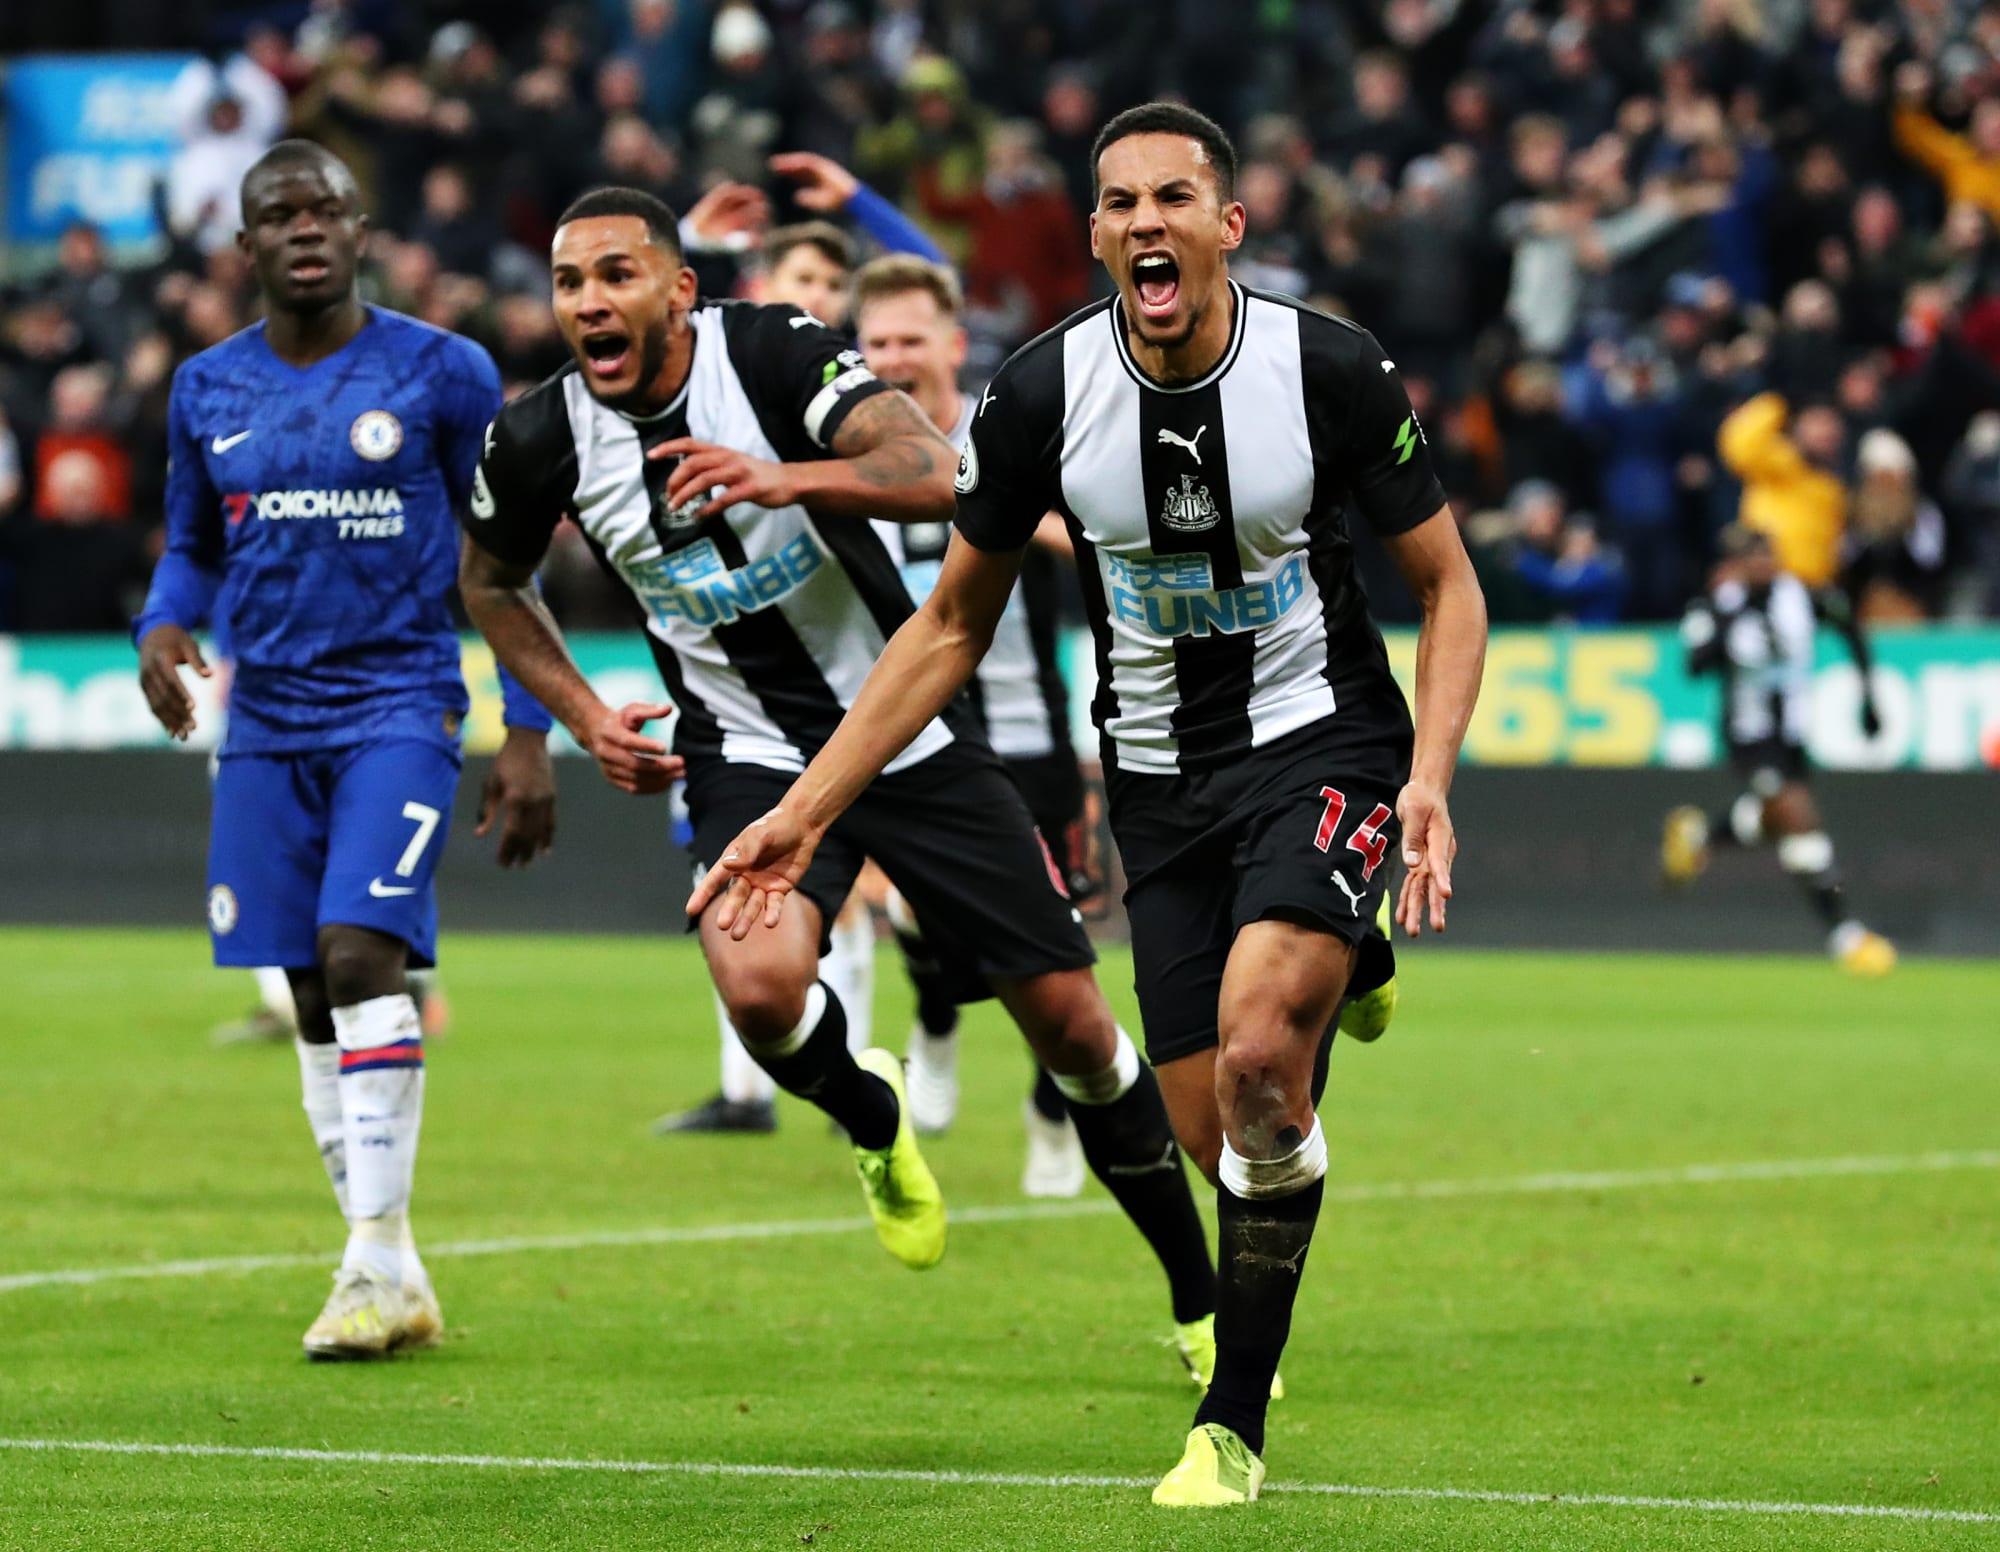 Newcastle United: Predicting the lineup vs. Sheffield United